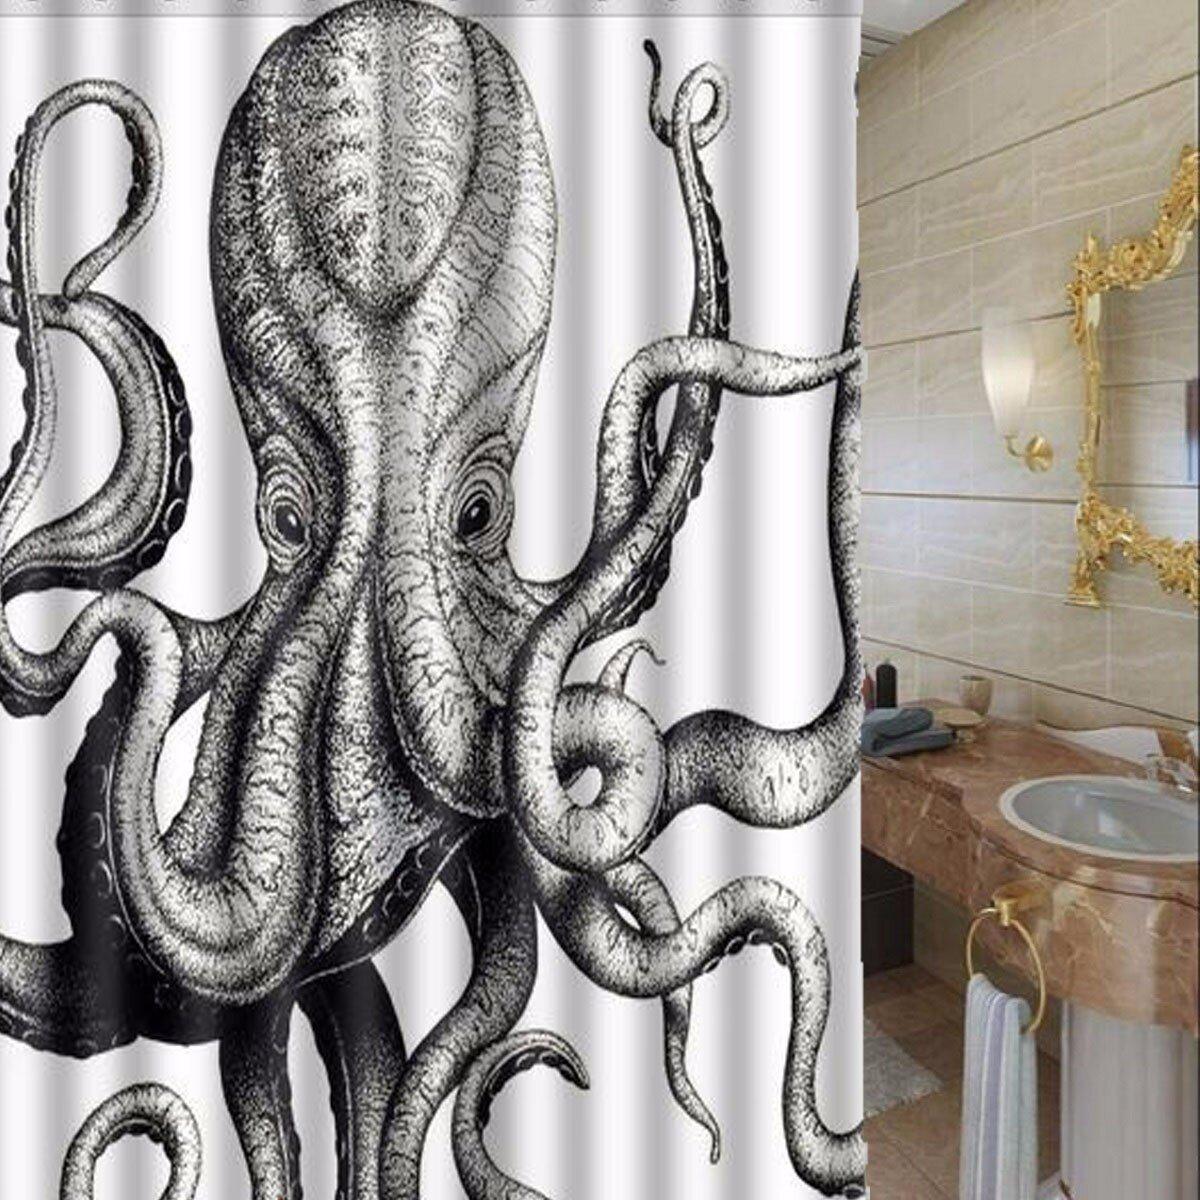 Octopus Bathroom Waterproof Shower Curtain Polyester Fabric Bathroom Curtain